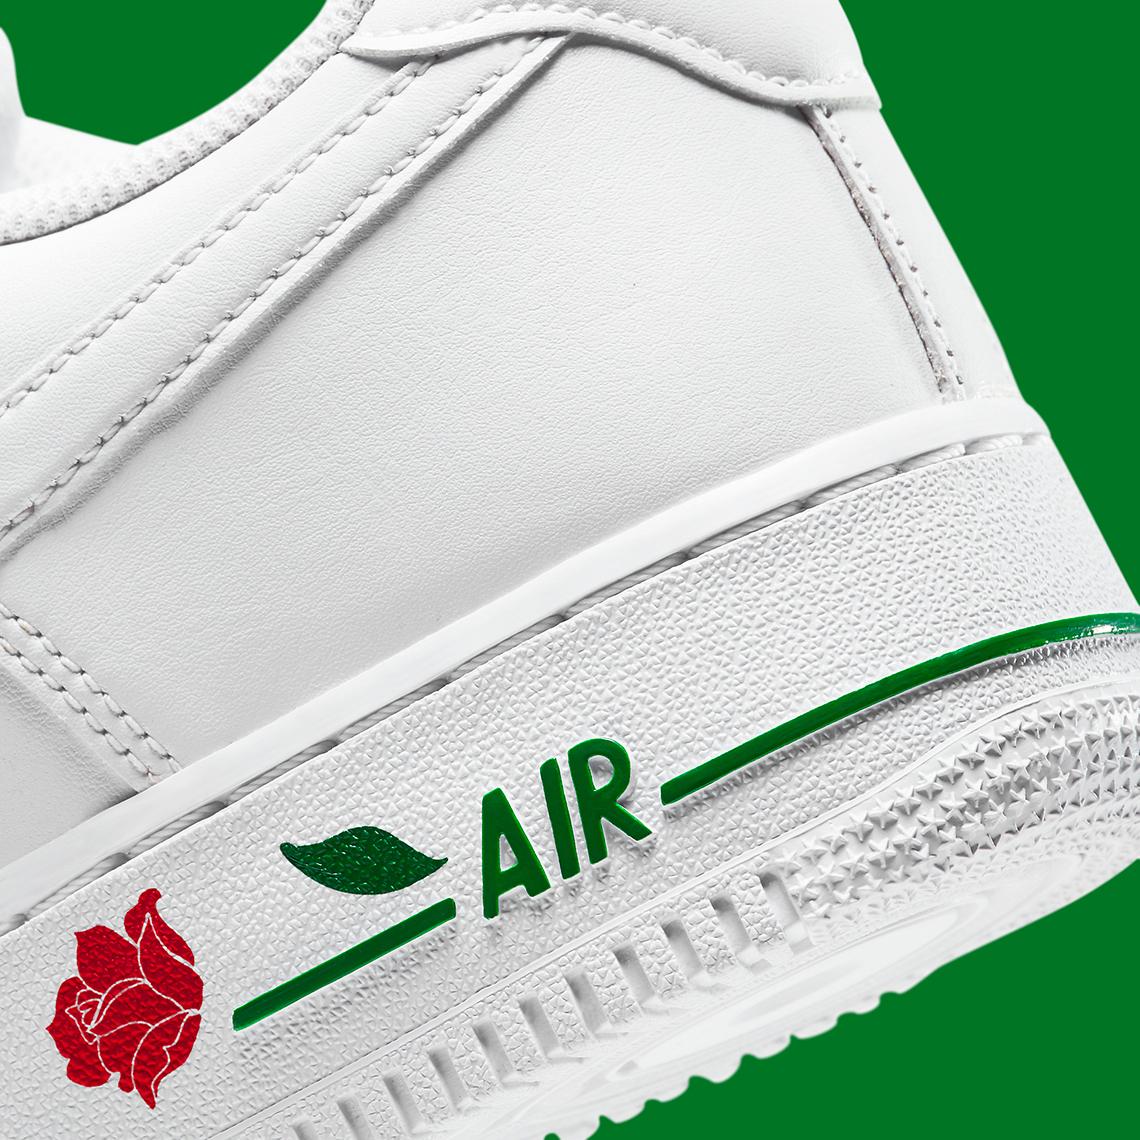 Nike Air Force 1 Low Rose CU6312-600 CU6312-100 | SneakerNews.com